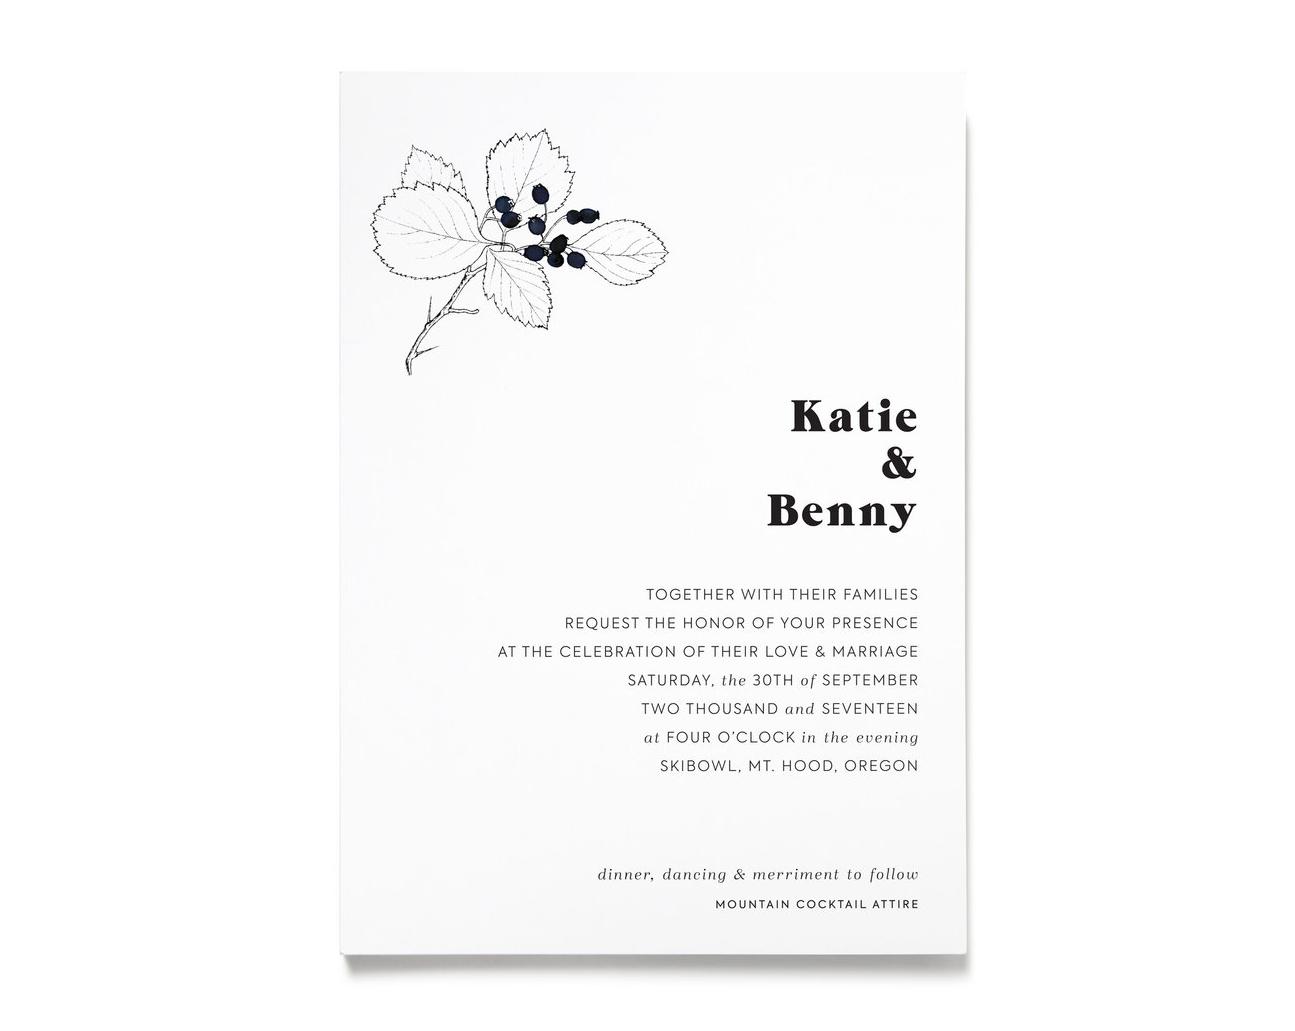 Katie_and_Benny_2.jpg